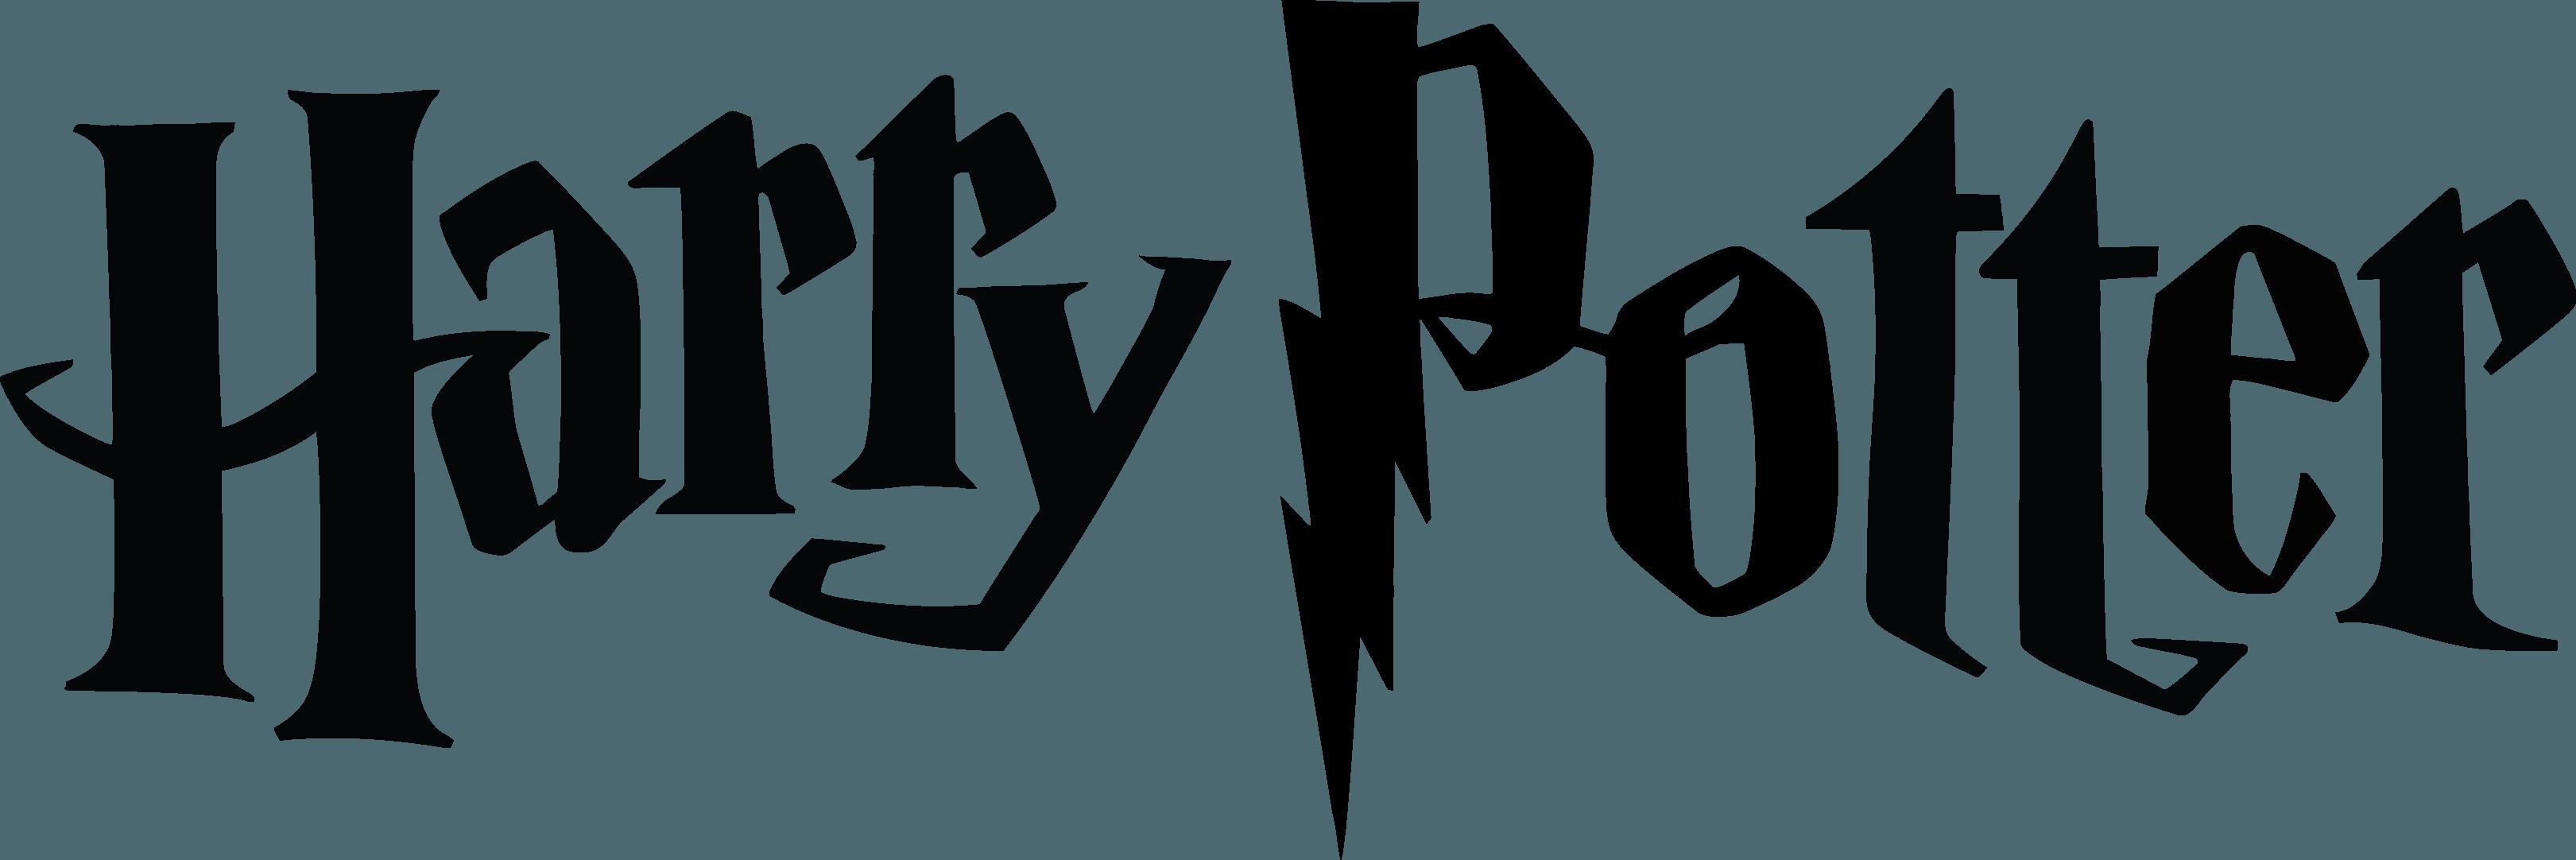 harry potter logo vector